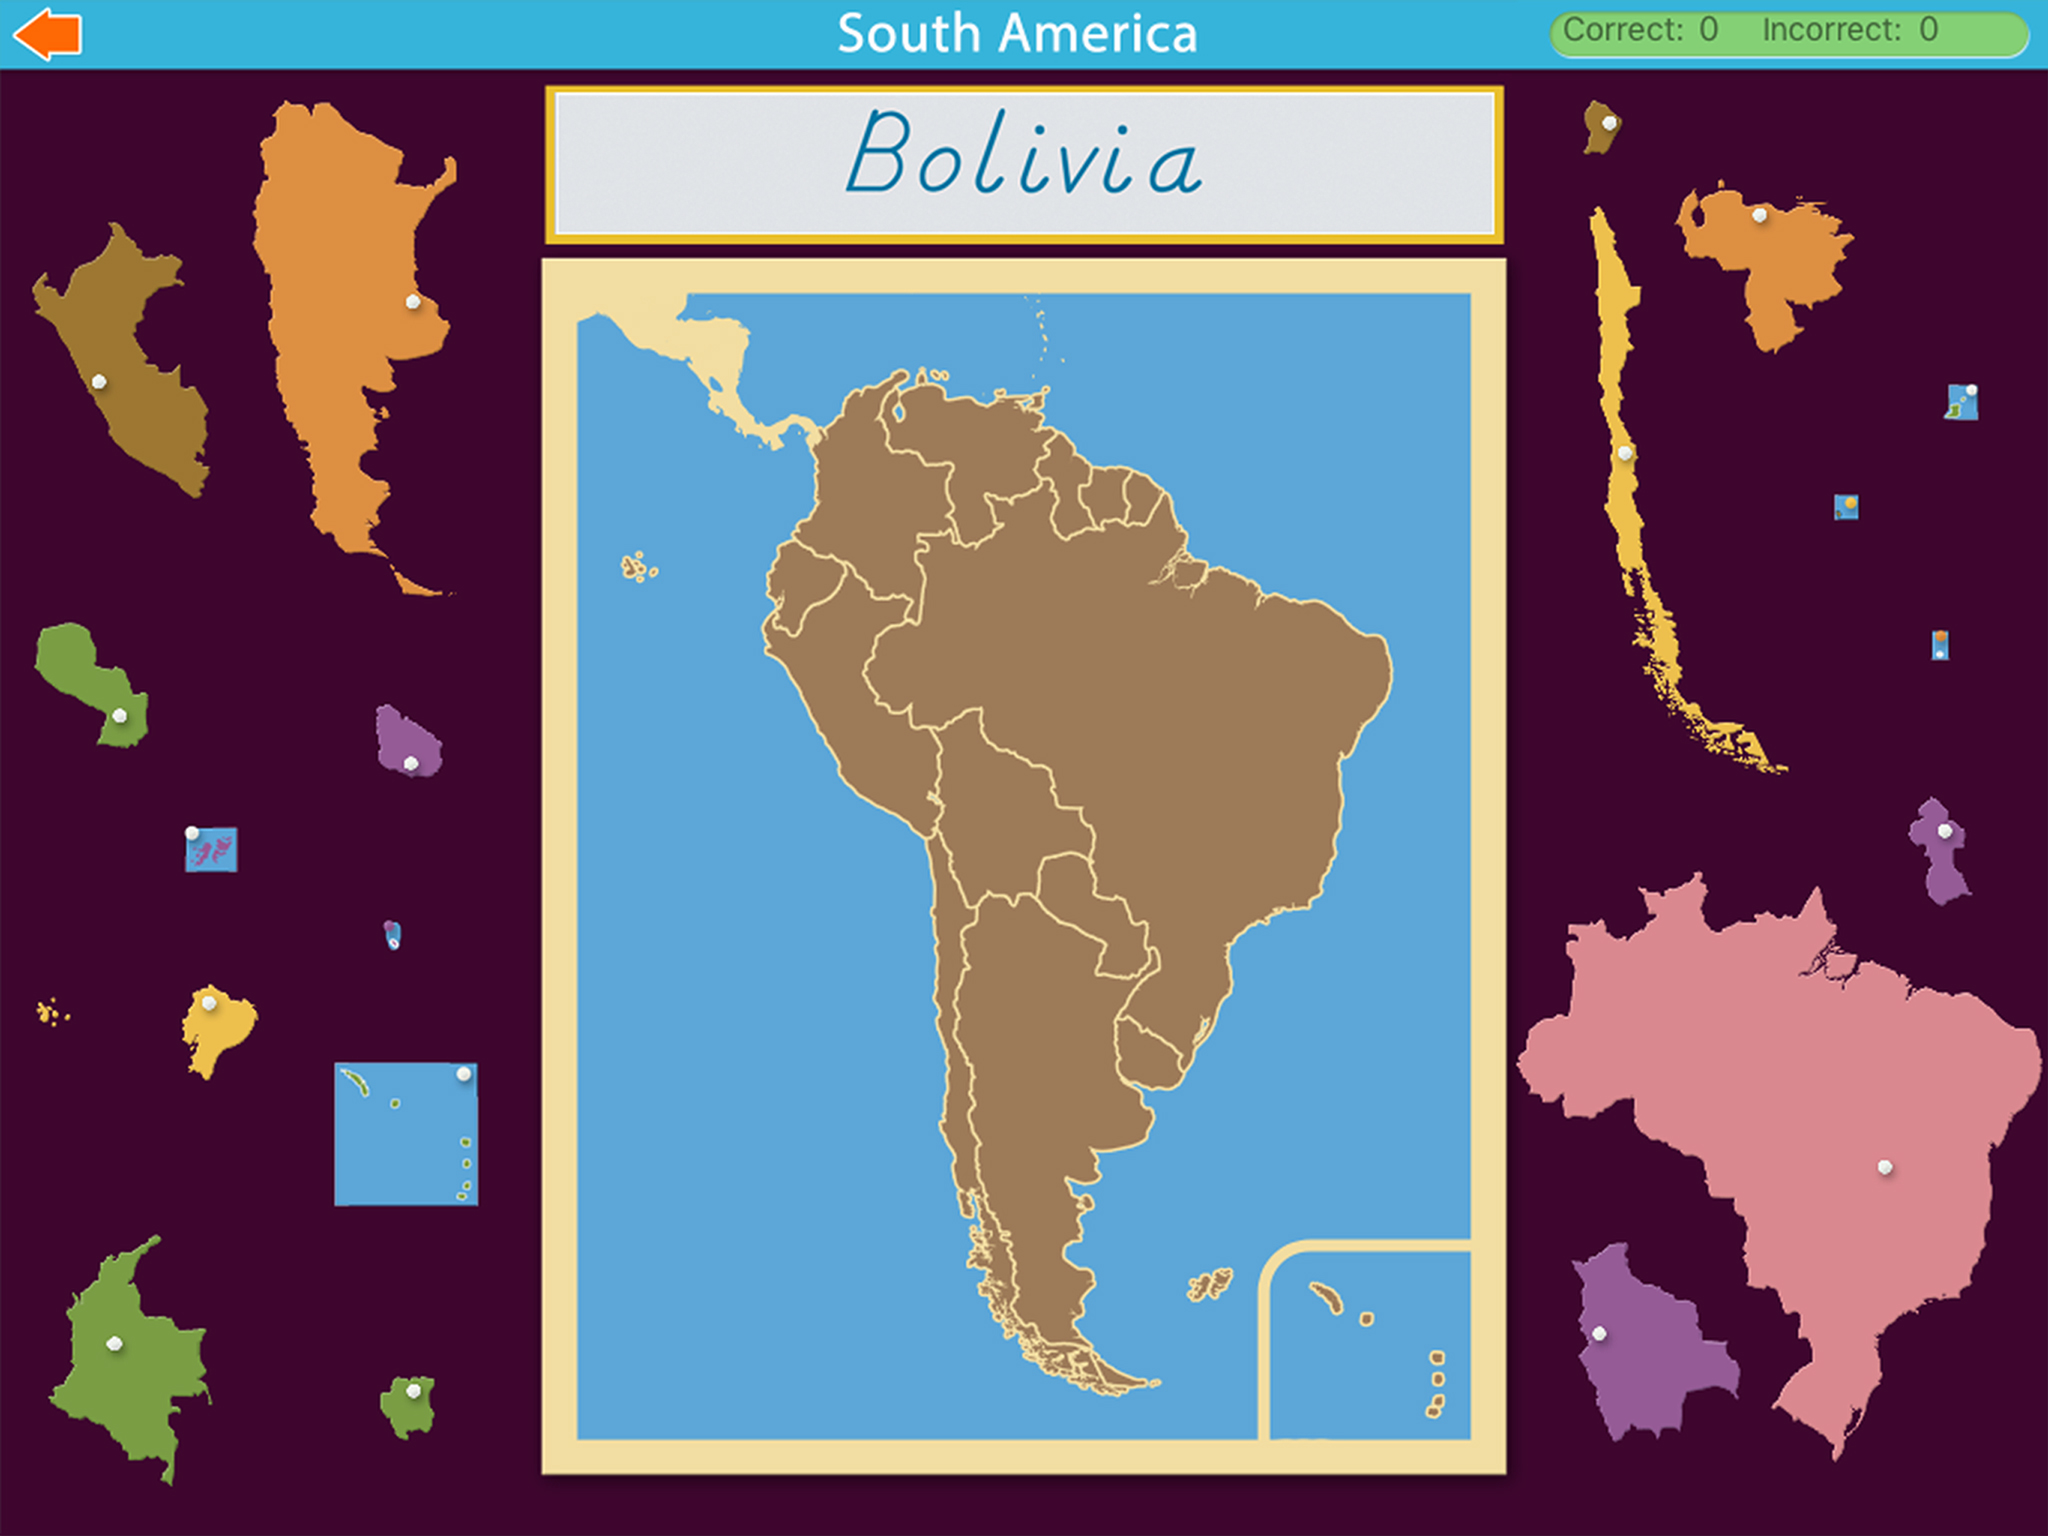 SouthAmericaGeographySouthAmericaGeographySouthAmericaGeographySouthAmericaGeography-reg.jpg